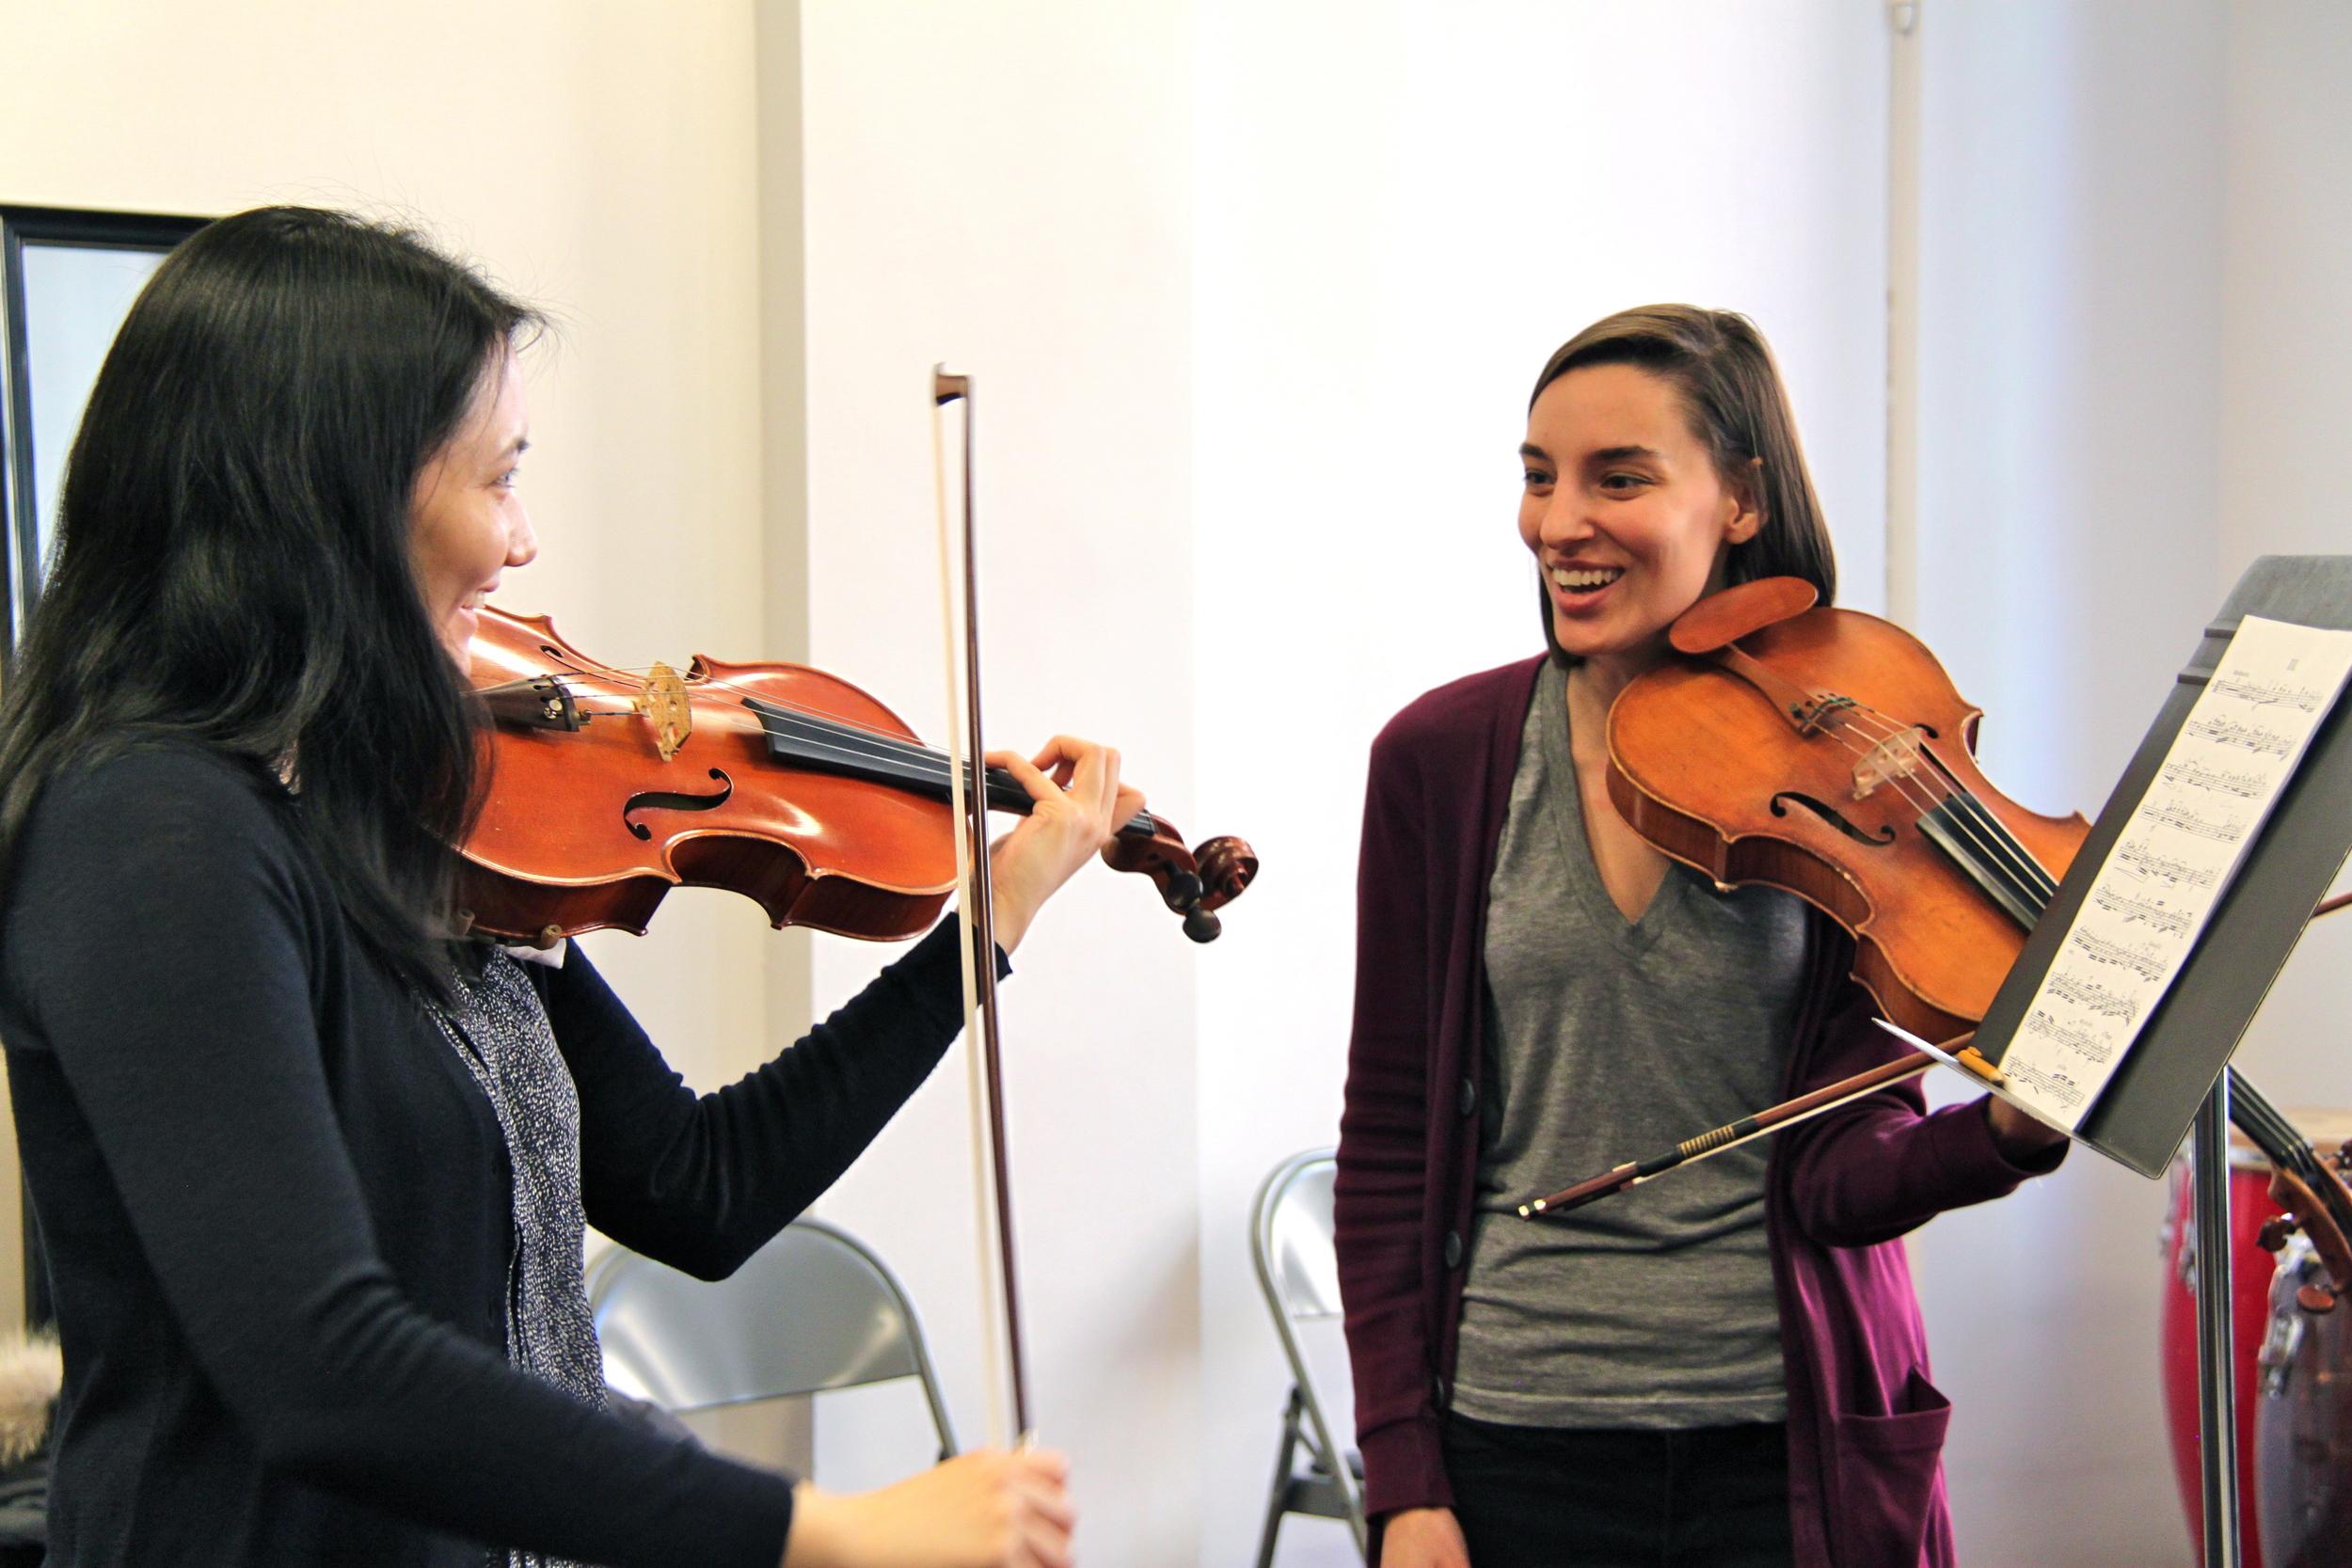 Teacher Nora Krohn in a viola or violin lesson at the Sunnyside, Queens New York String Studio